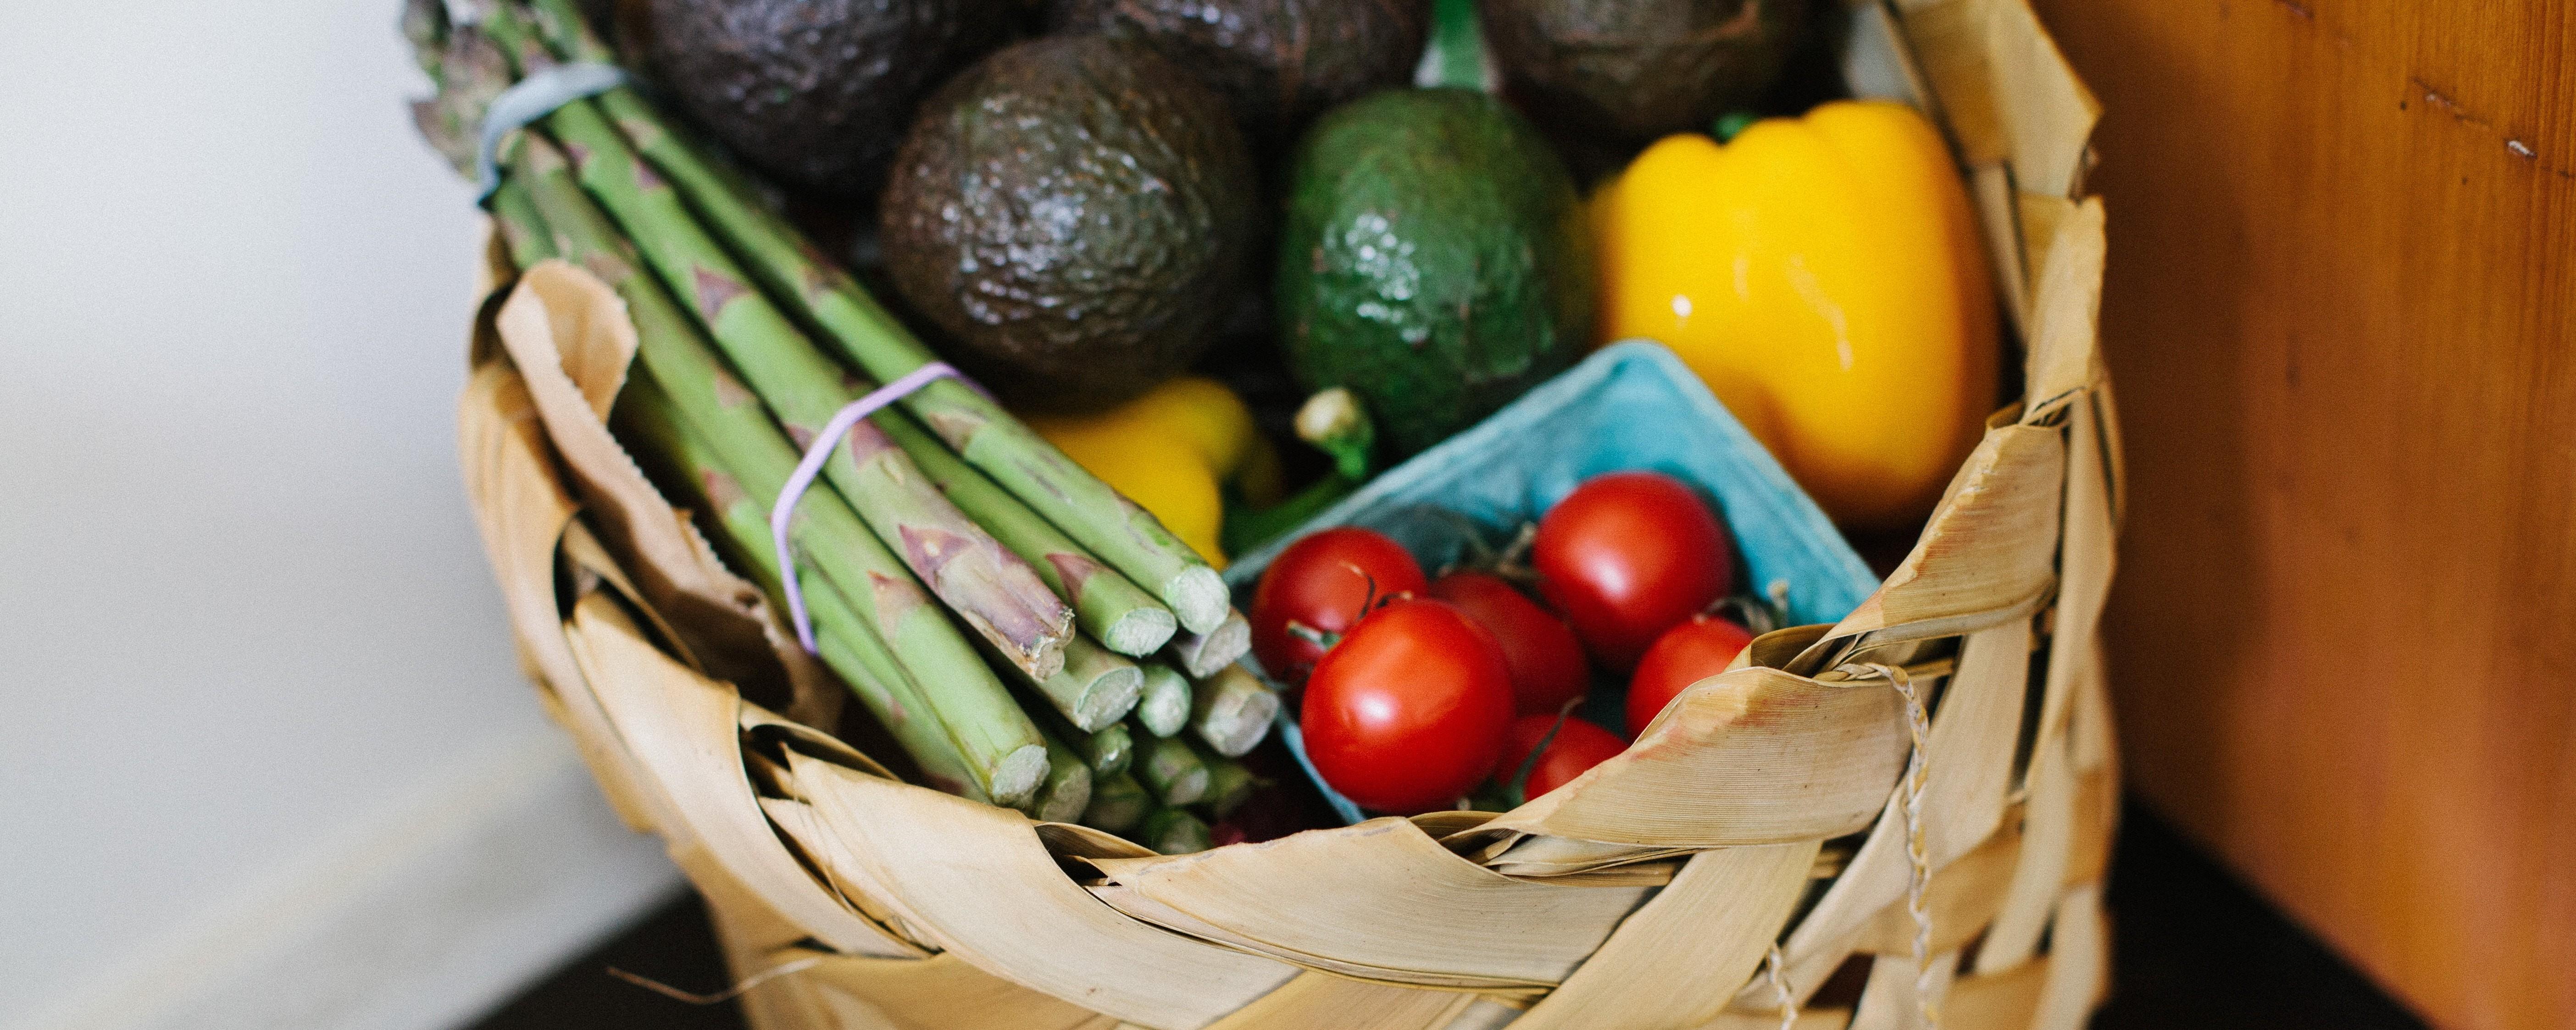 slabesti daca mananci numai fructe si legume)